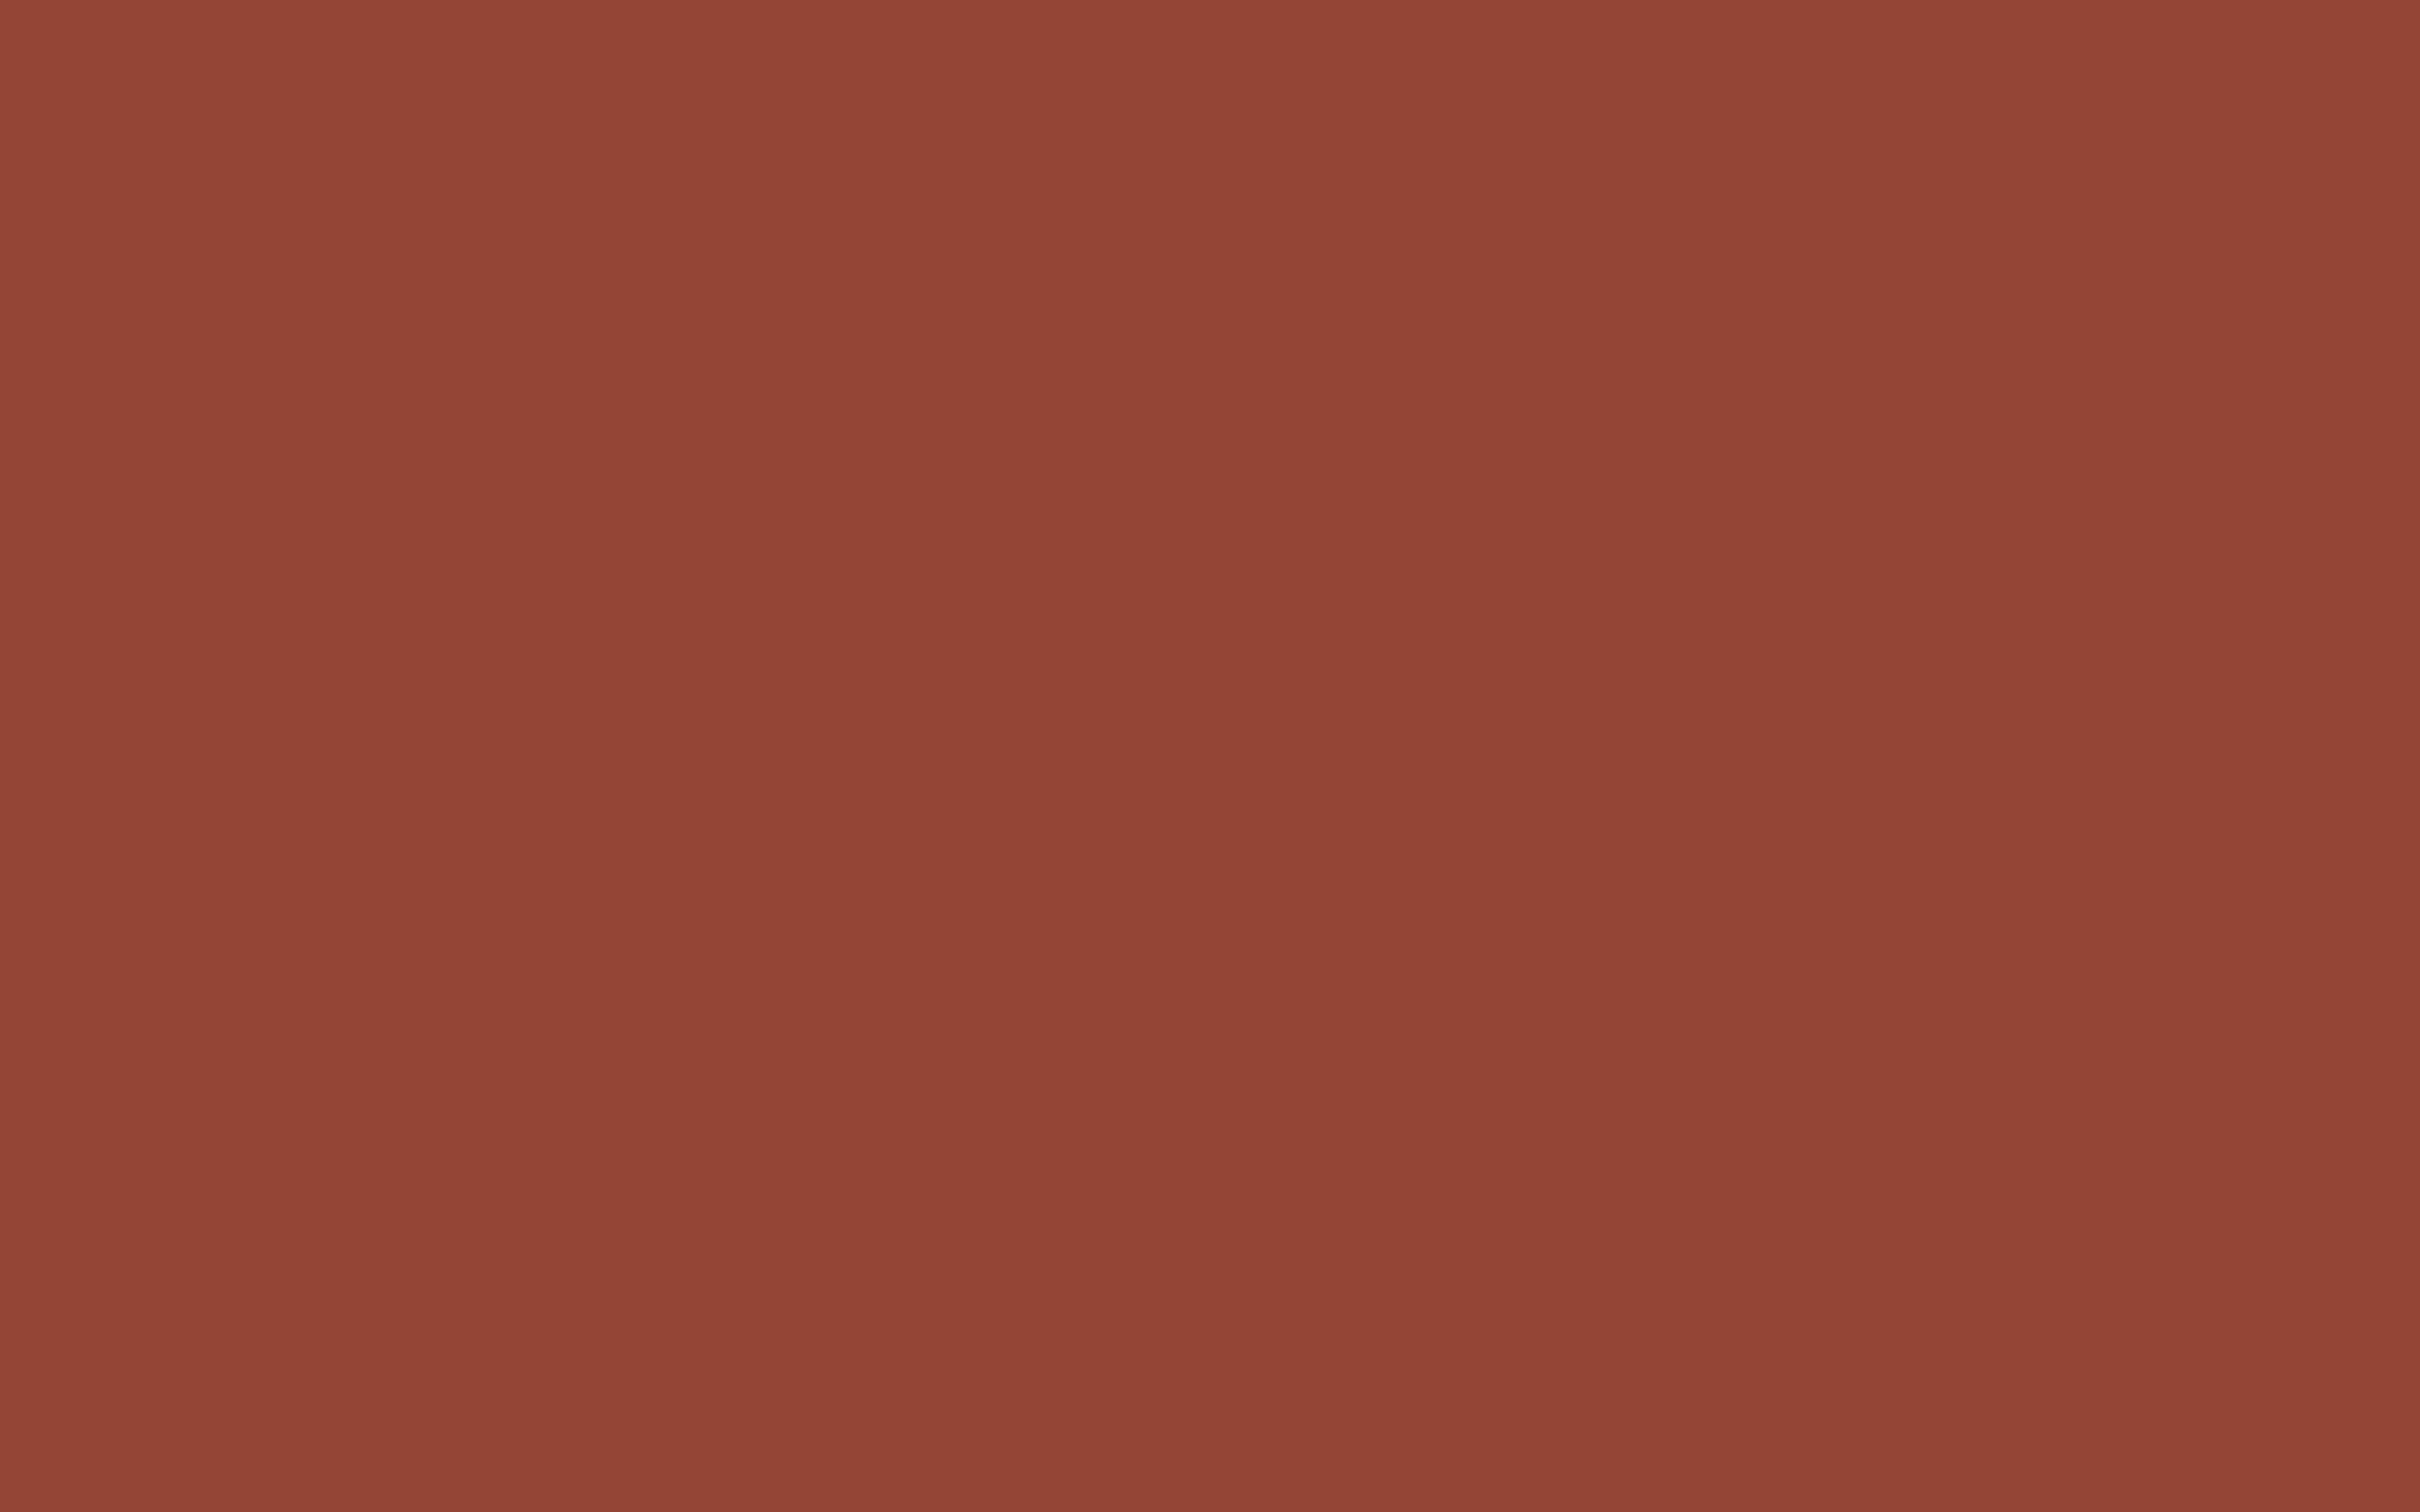 2560x1600 Chestnut Solid Color Background